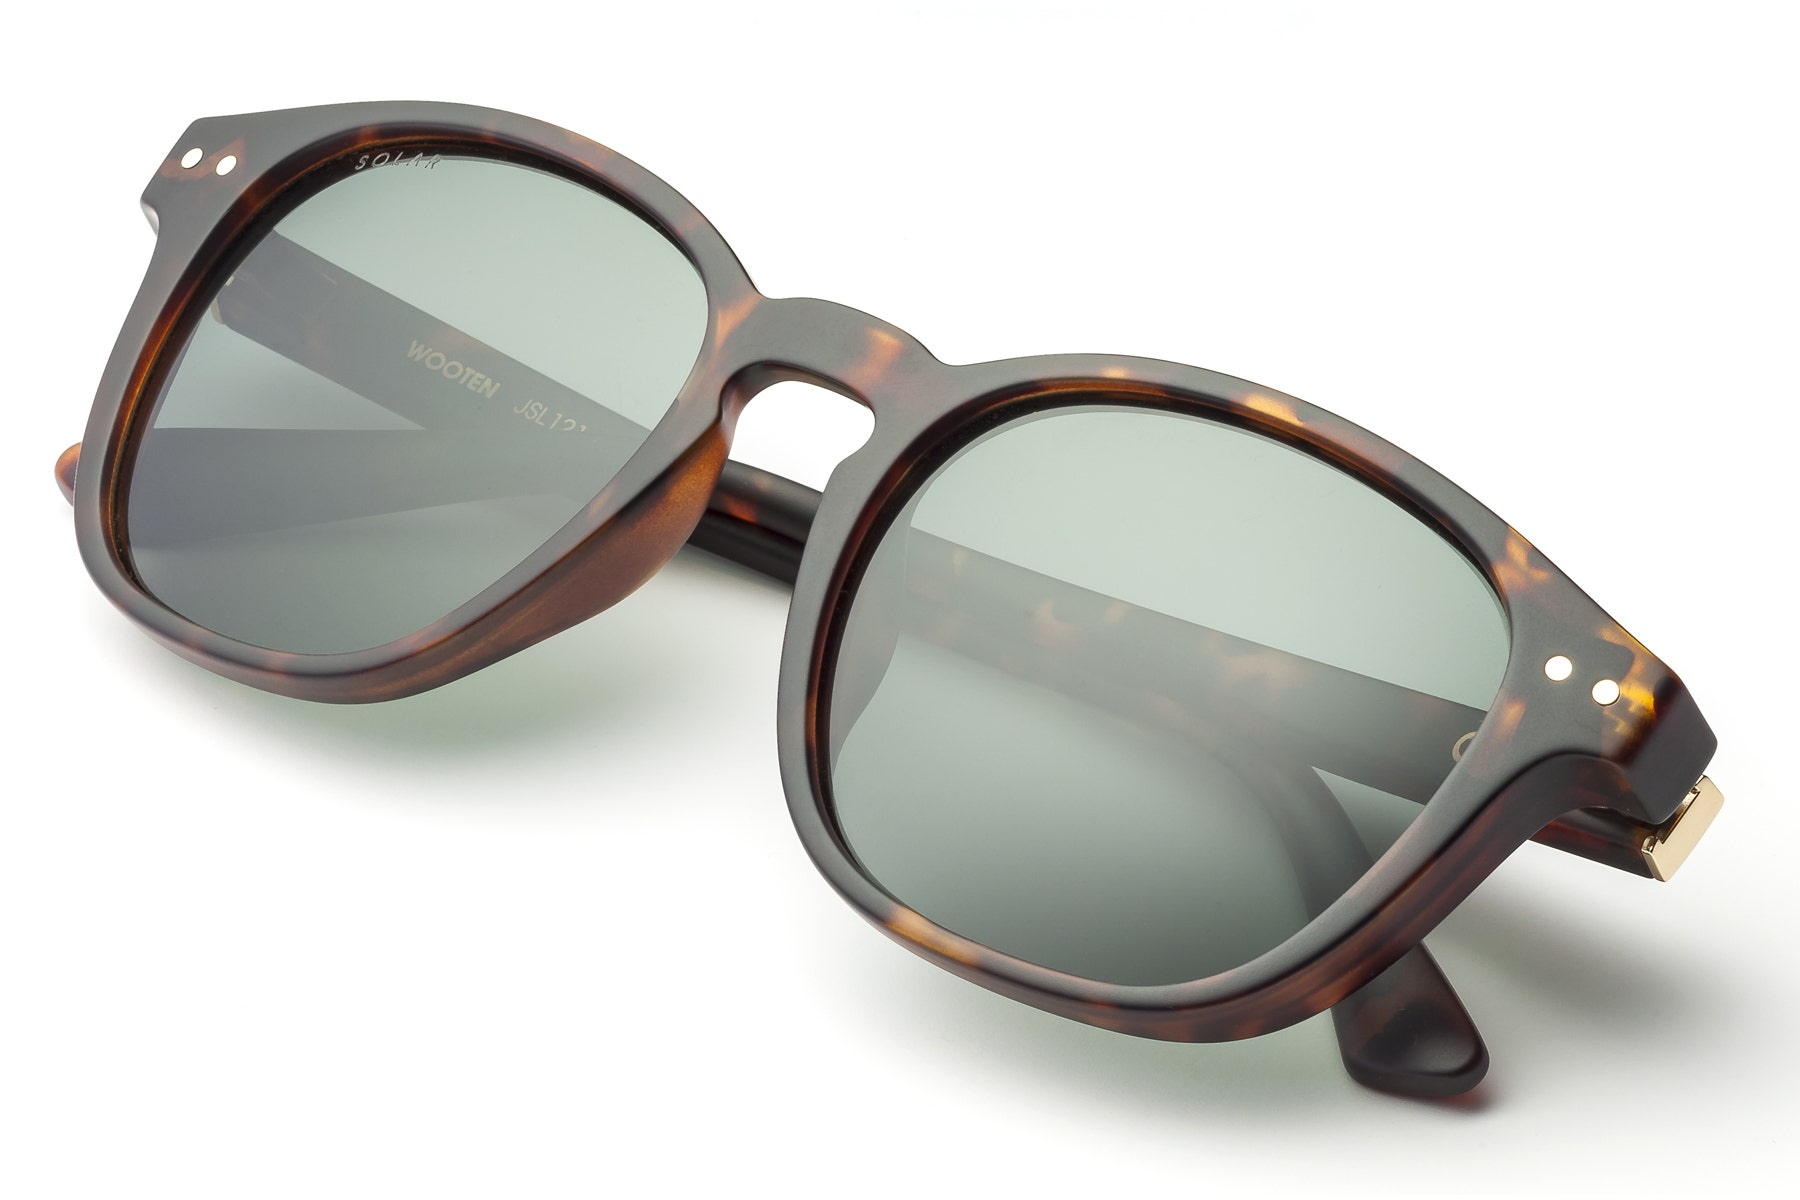 Polarised sunglasses Wooten for men